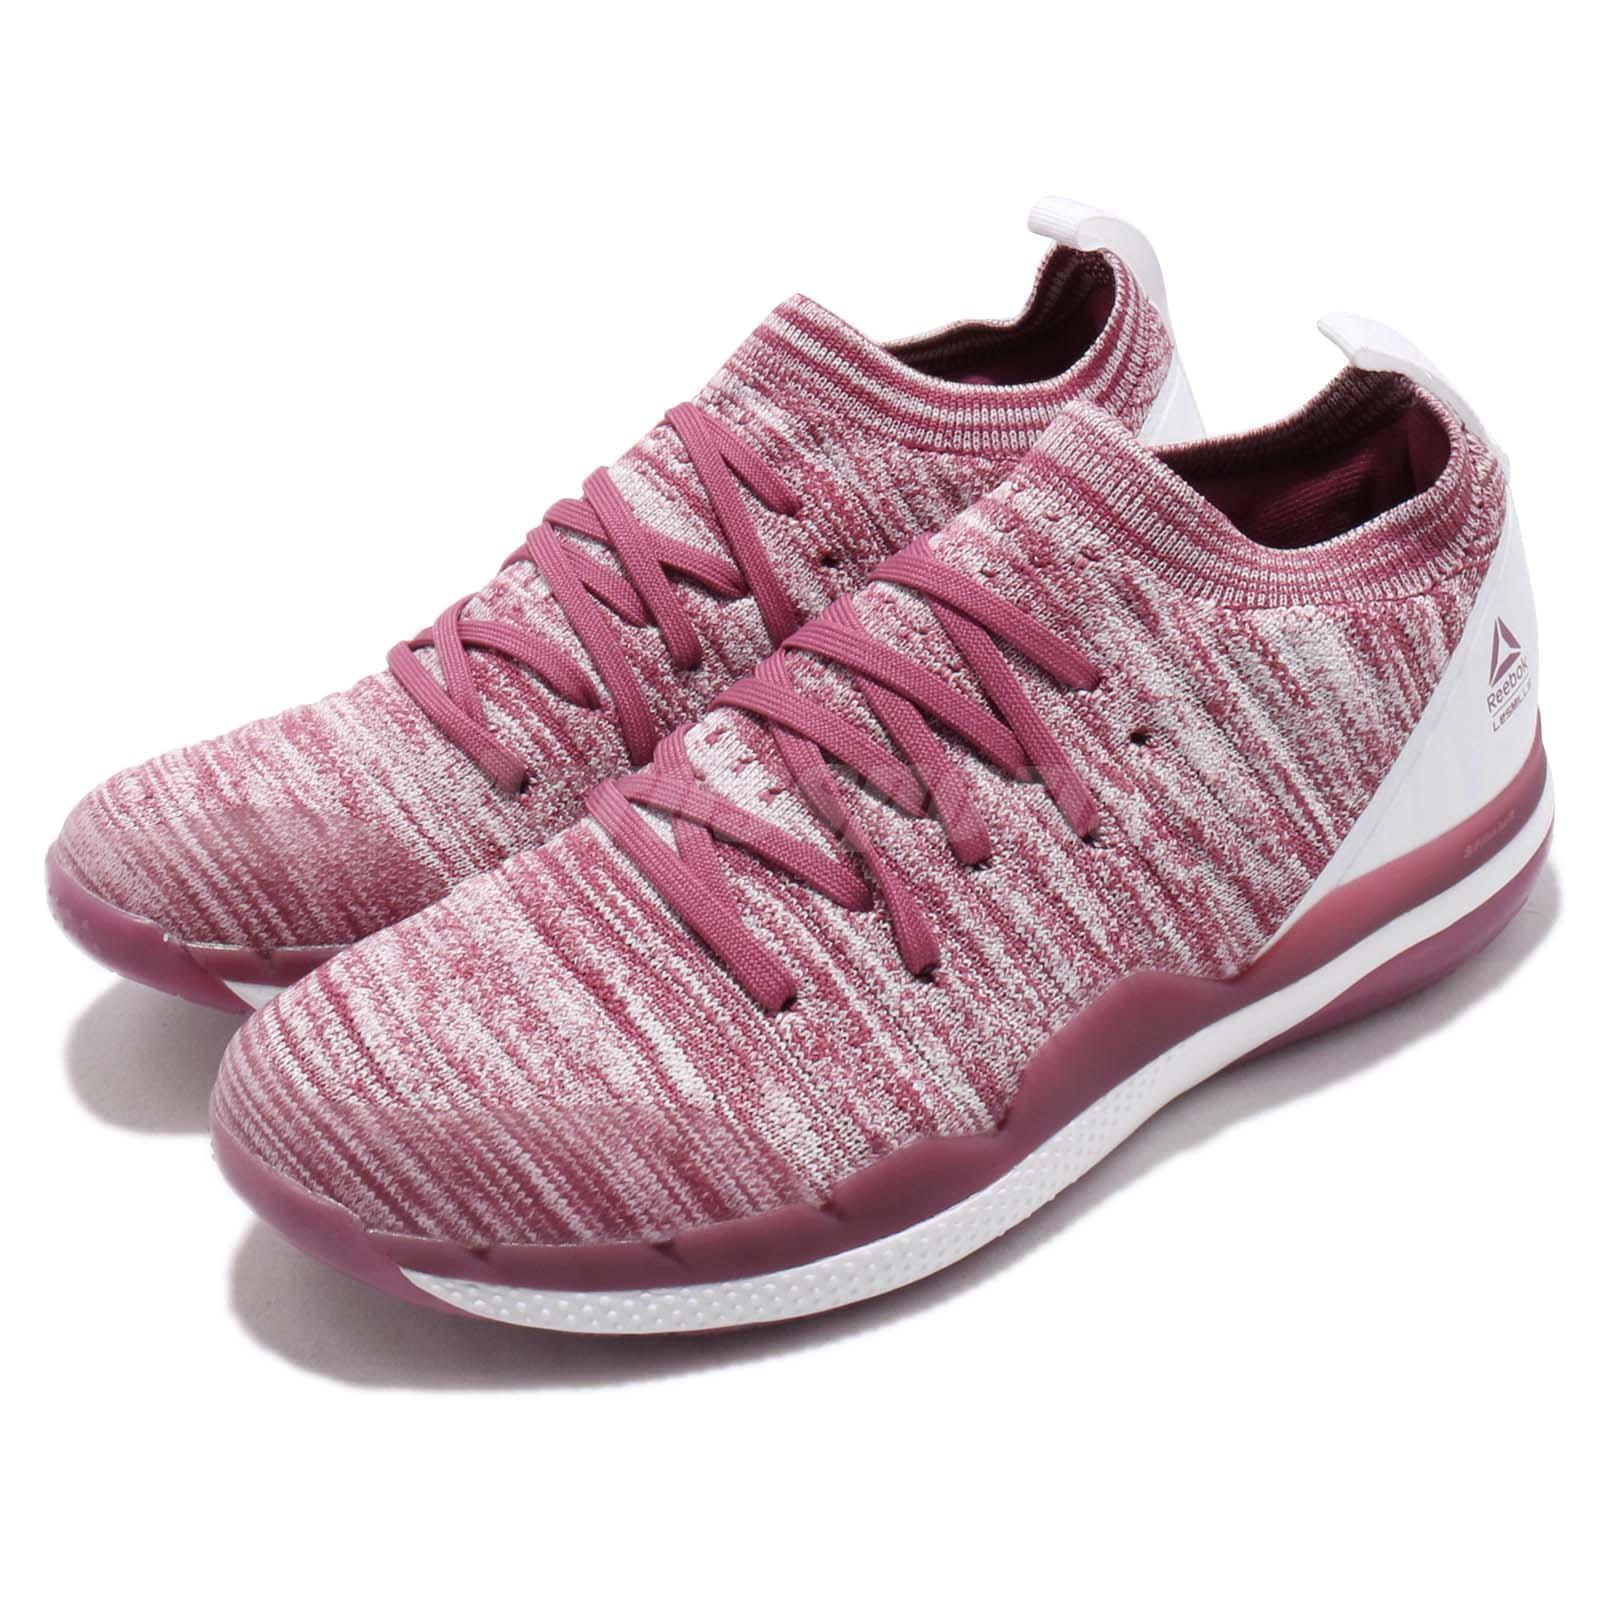 Reebok Ultra Circuit TR ULTK LM Twisted Berry Berry Berry mujer Cross Training zapatos CN6343  Tu satisfacción es nuestro objetivo